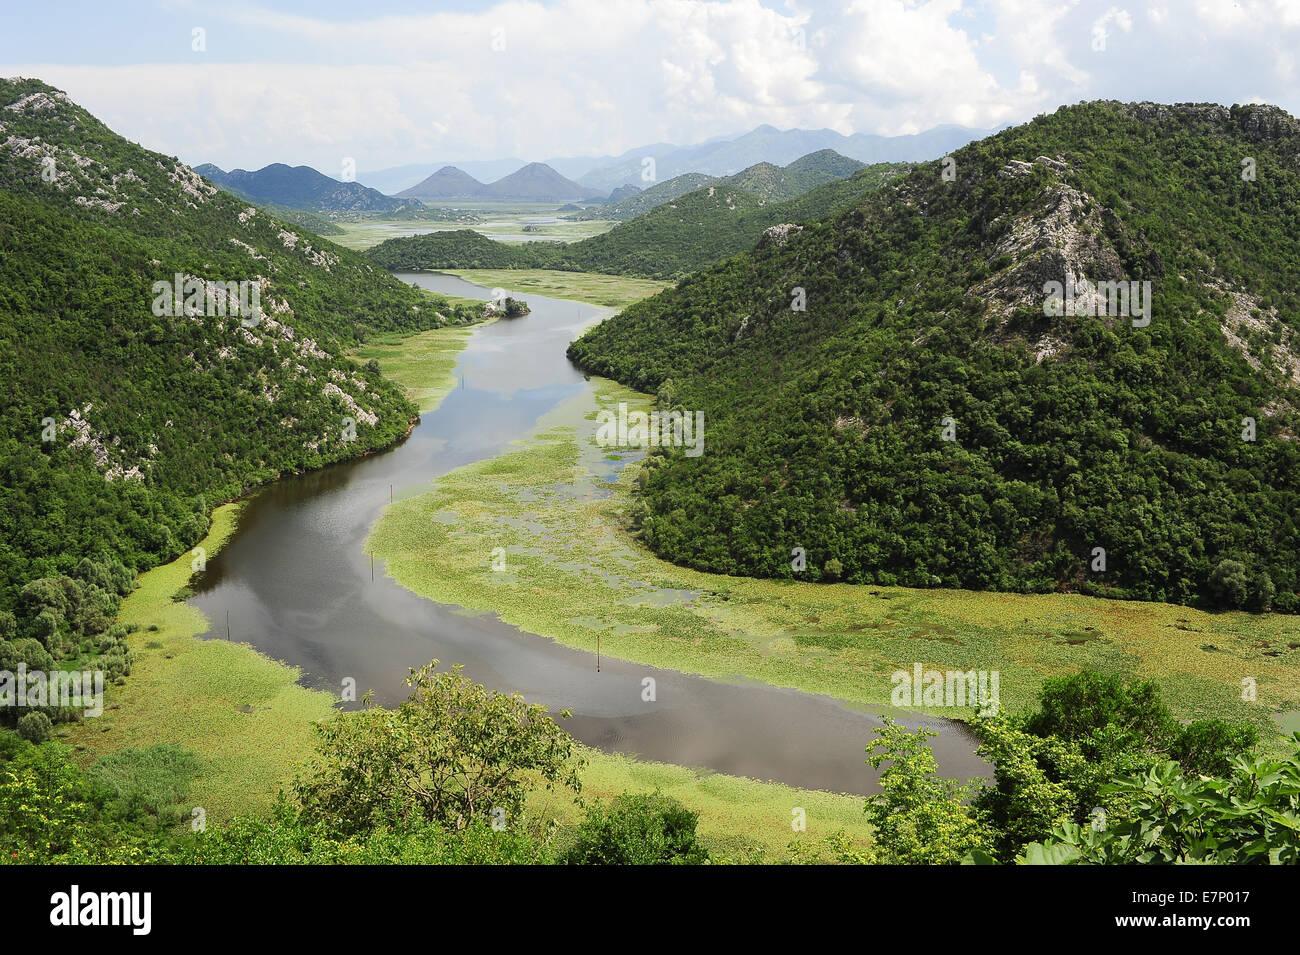 Balkans, scenery, landscape, country, Europe, green, idyllic, jezero, lake, landscape, Montenegro, mountain, mountains, - Stock Image